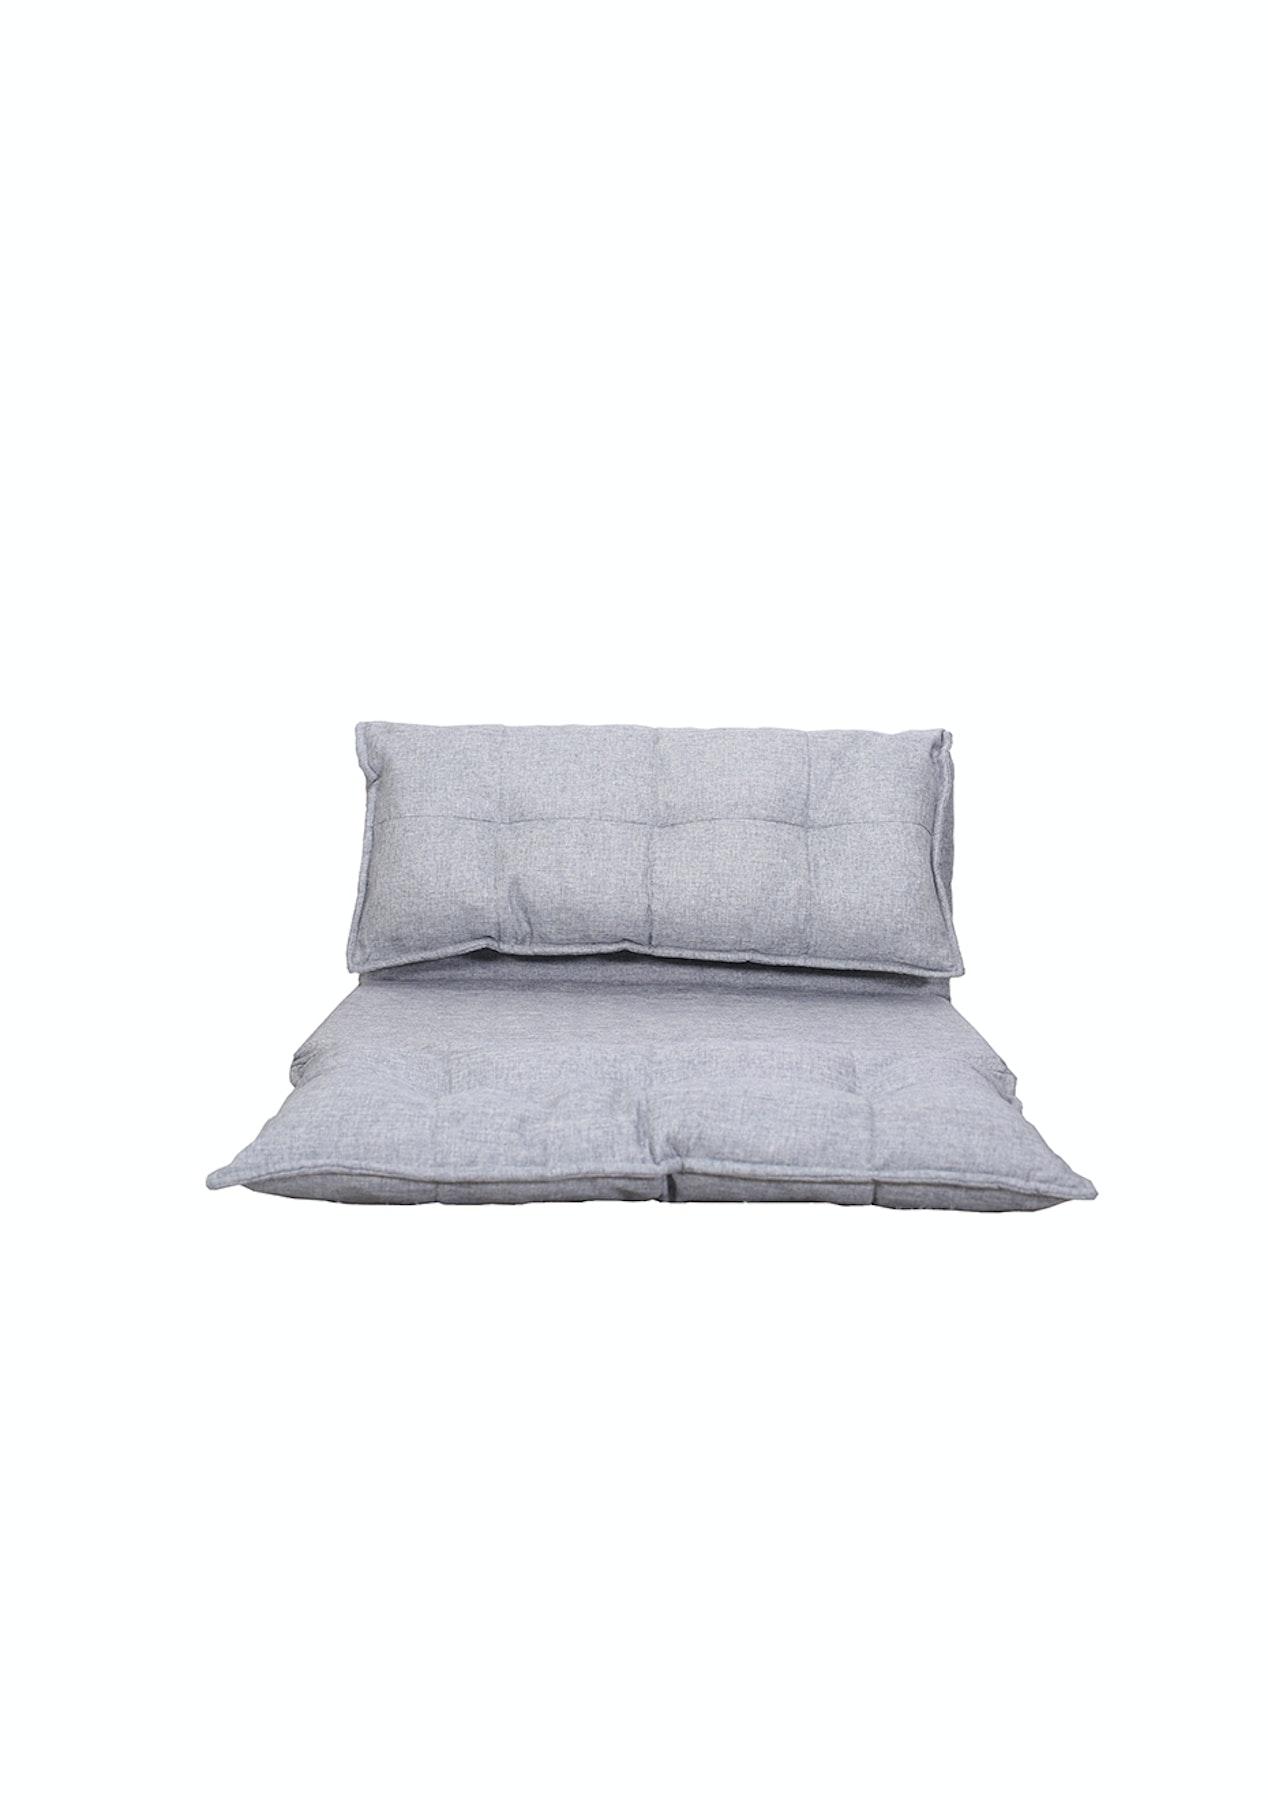 Super Double Folding Sofa Lounge Chair Grey Cjindustries Chair Design For Home Cjindustriesco